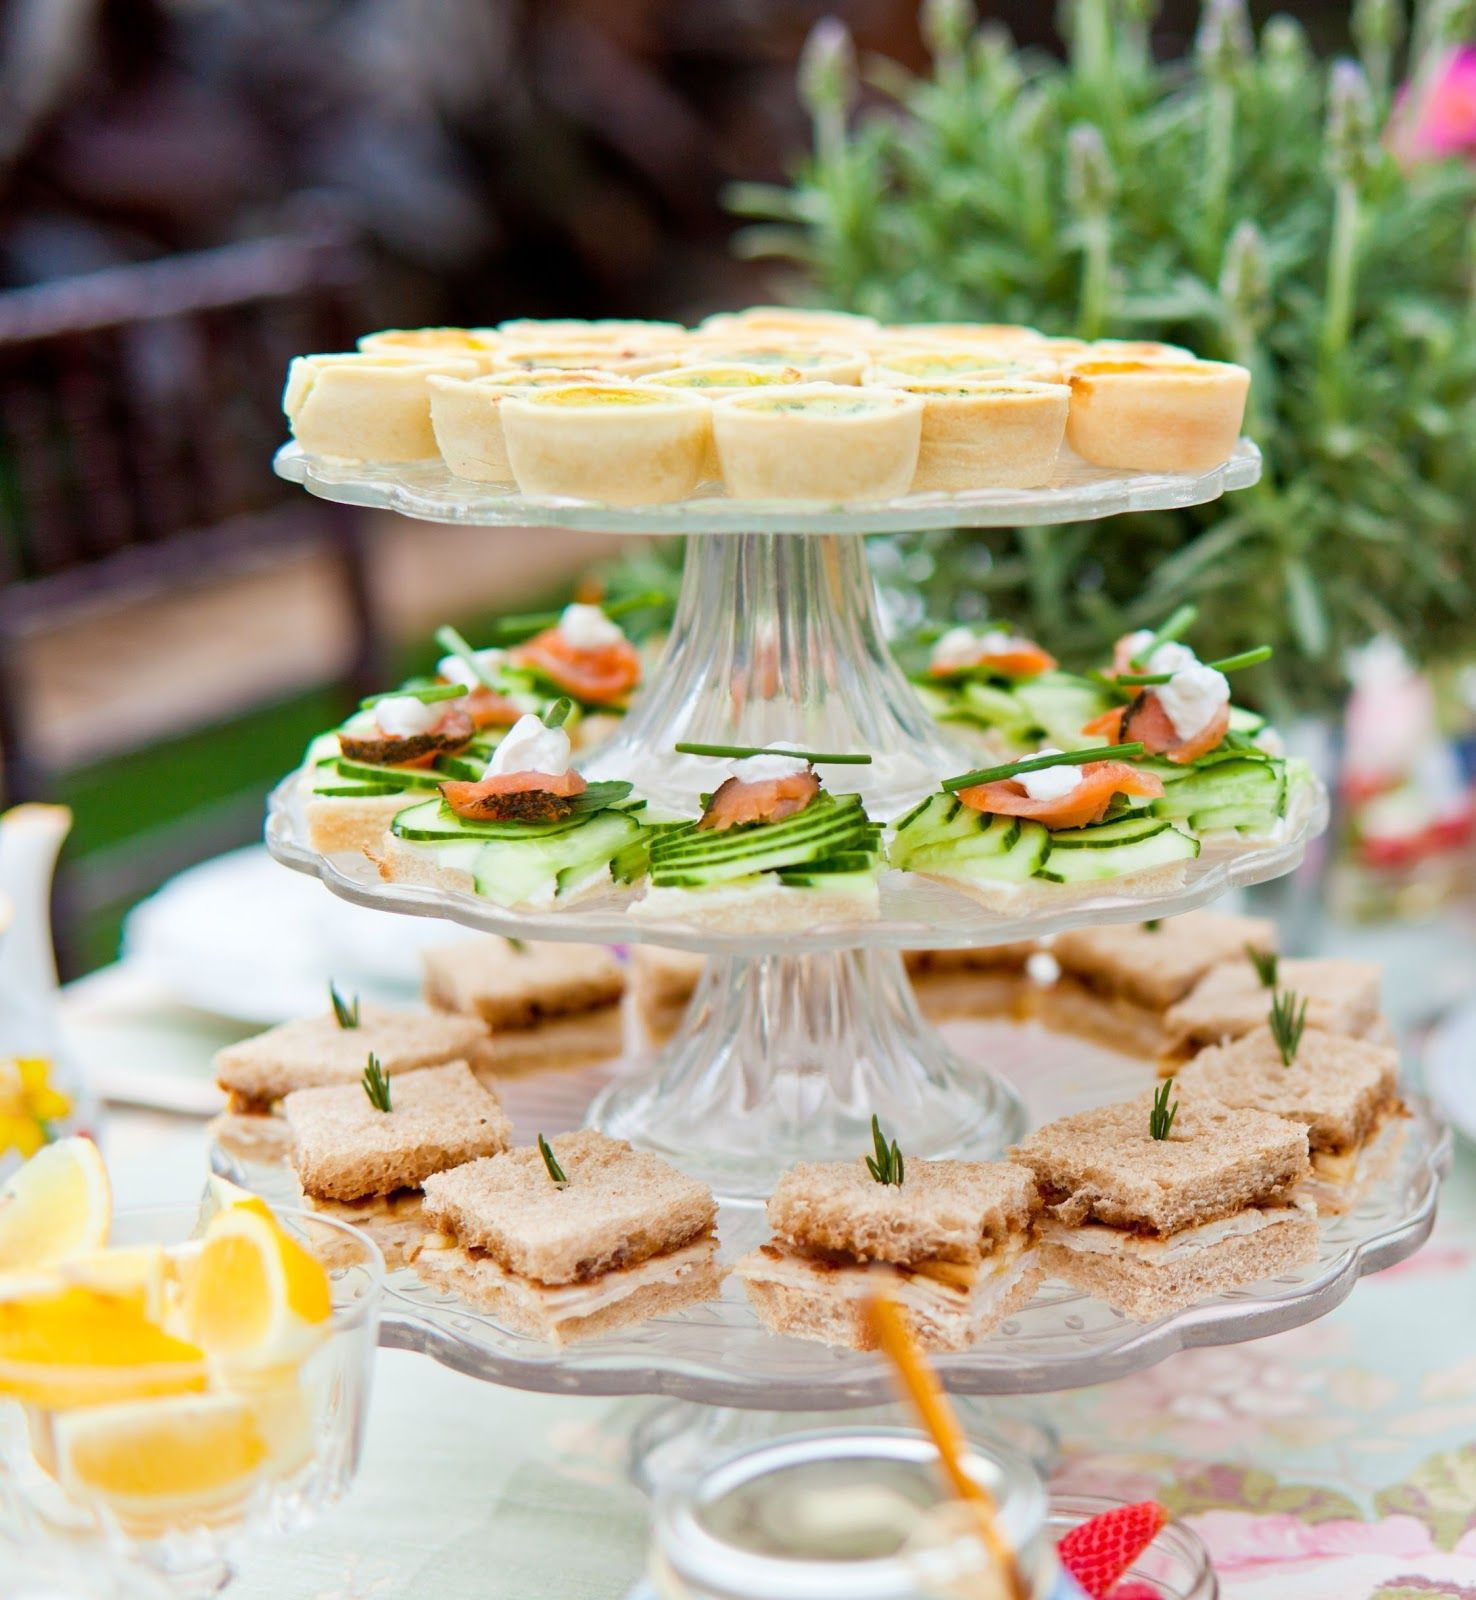 Wedding Party Food: Garden Tea Table Arrangement Ideas To Make Your Next Tea